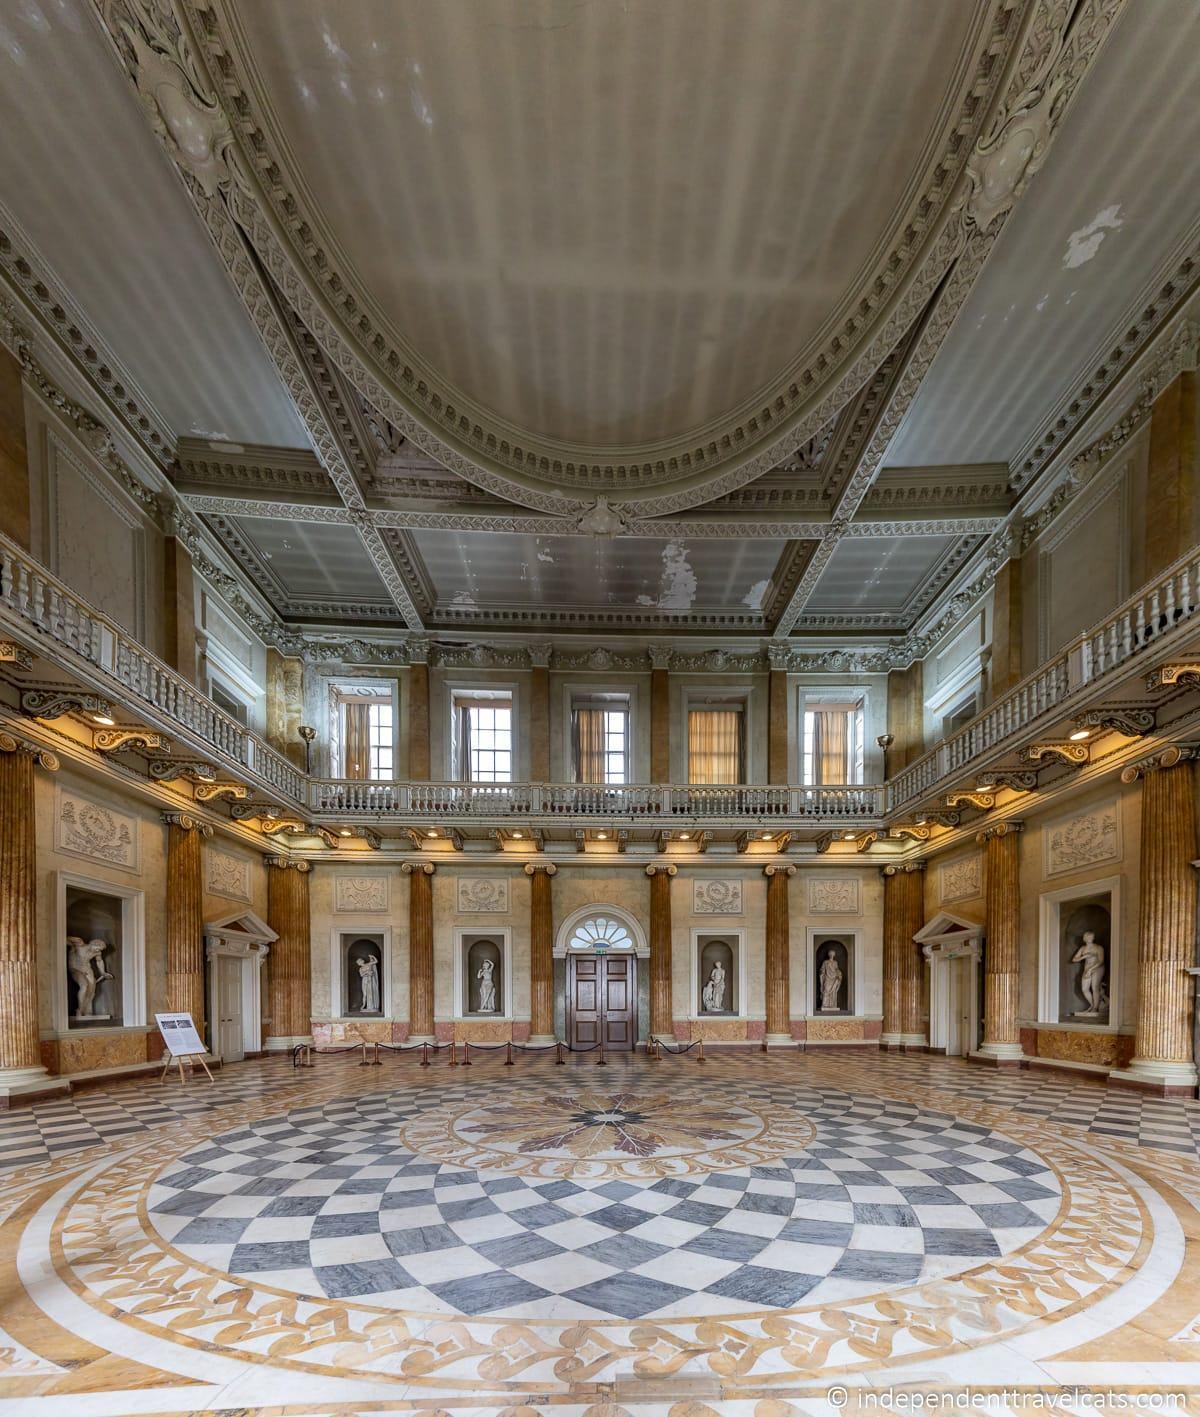 Marble Saloon Wentworth Woodhouse Marble Hall ballroom